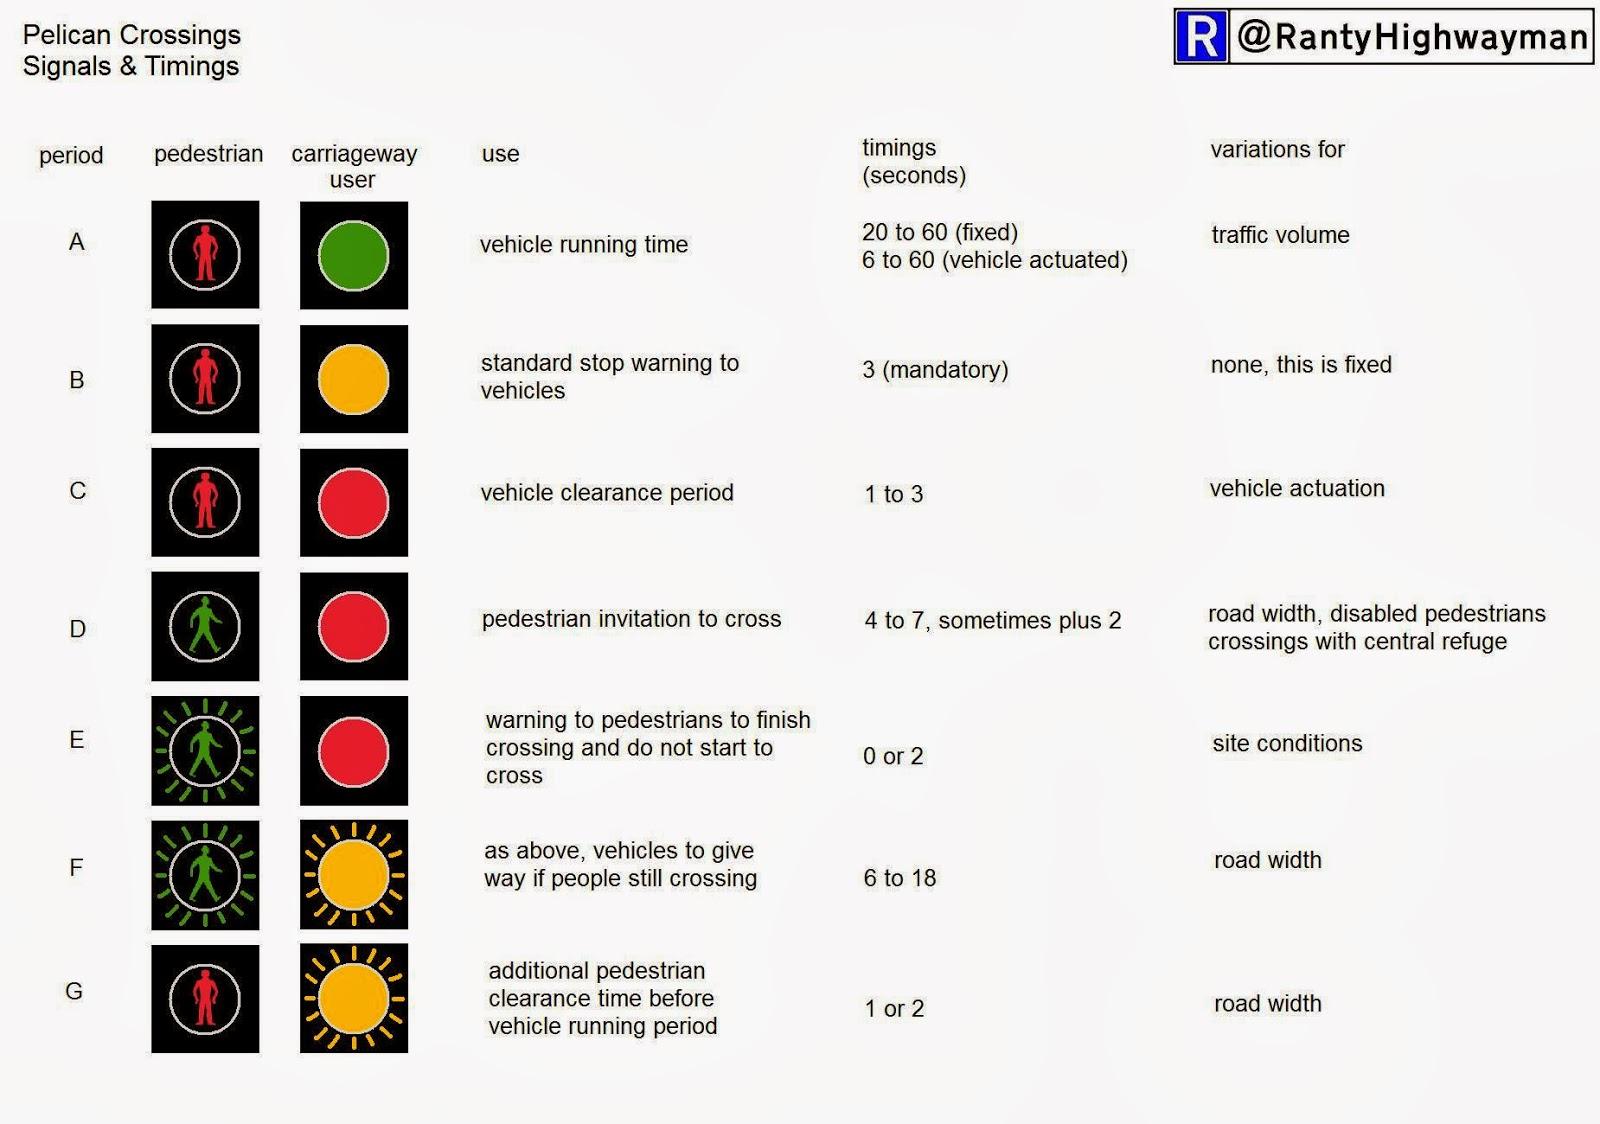 The Ranty Highwayman Traffic Signal Pie